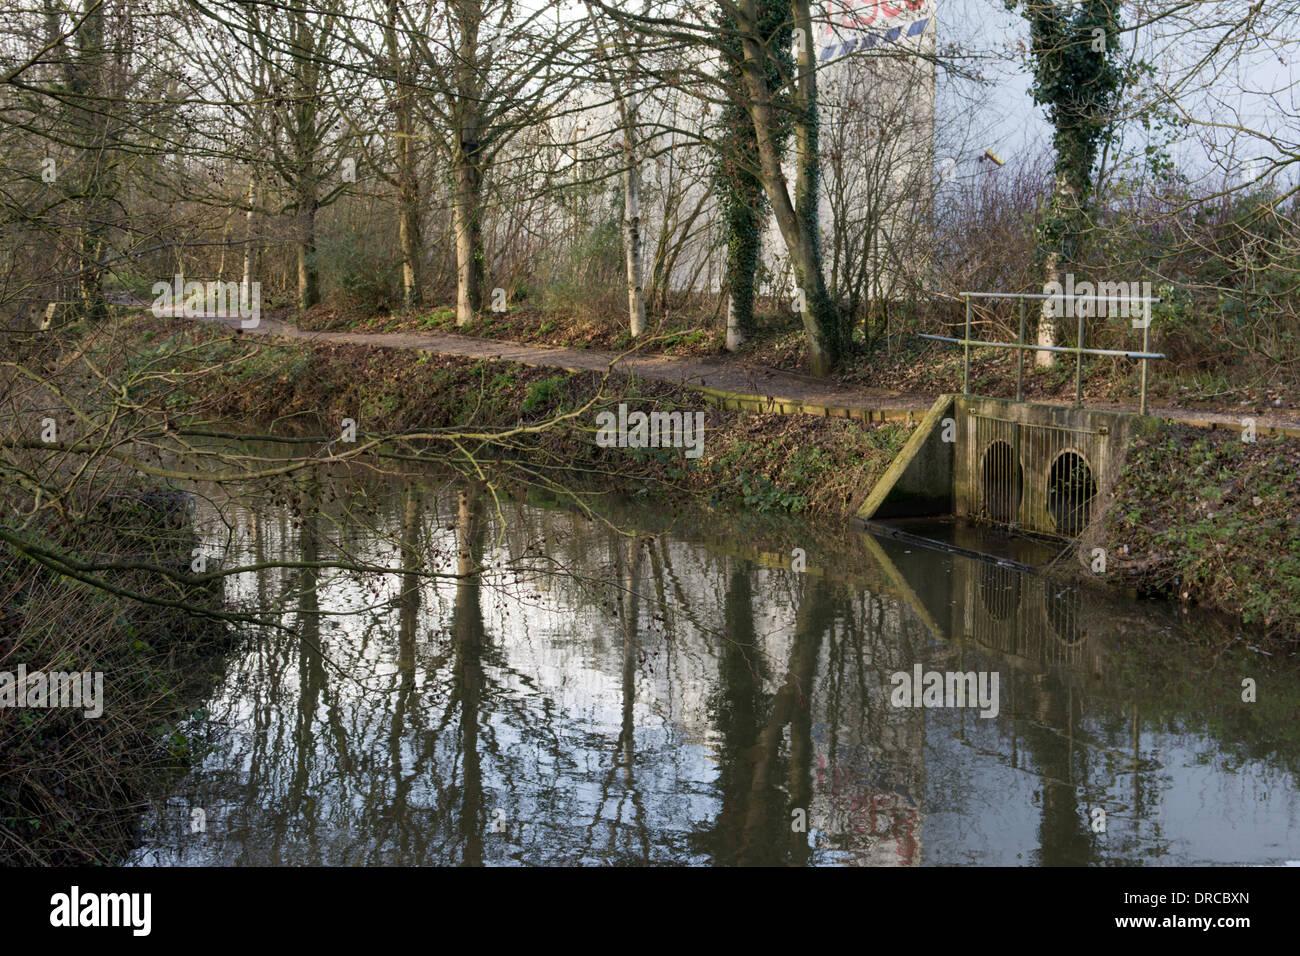 Slacker on the River Waveney, Diss, Norfolk, England - Stock Image